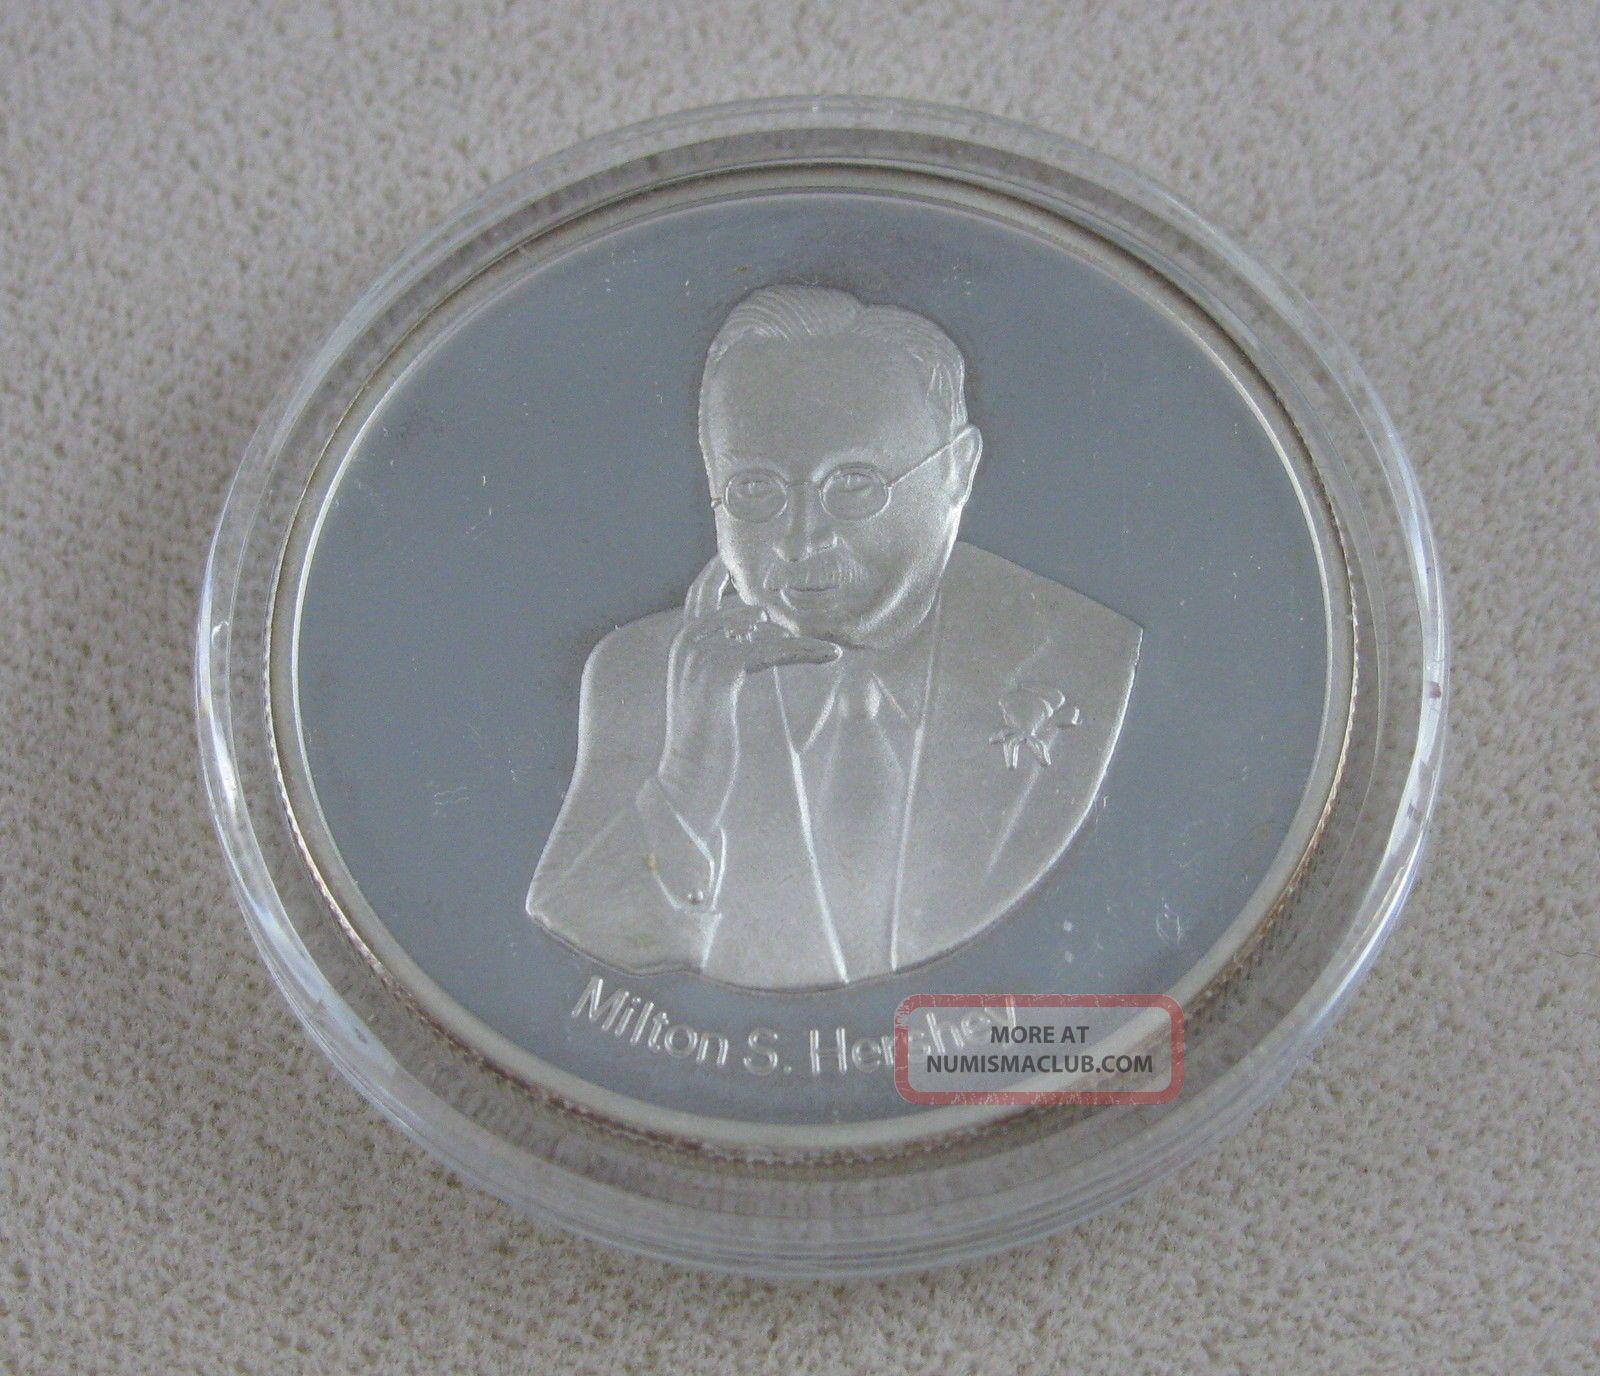 Milton S Hershey Chocolate 999 Silver Round Employee